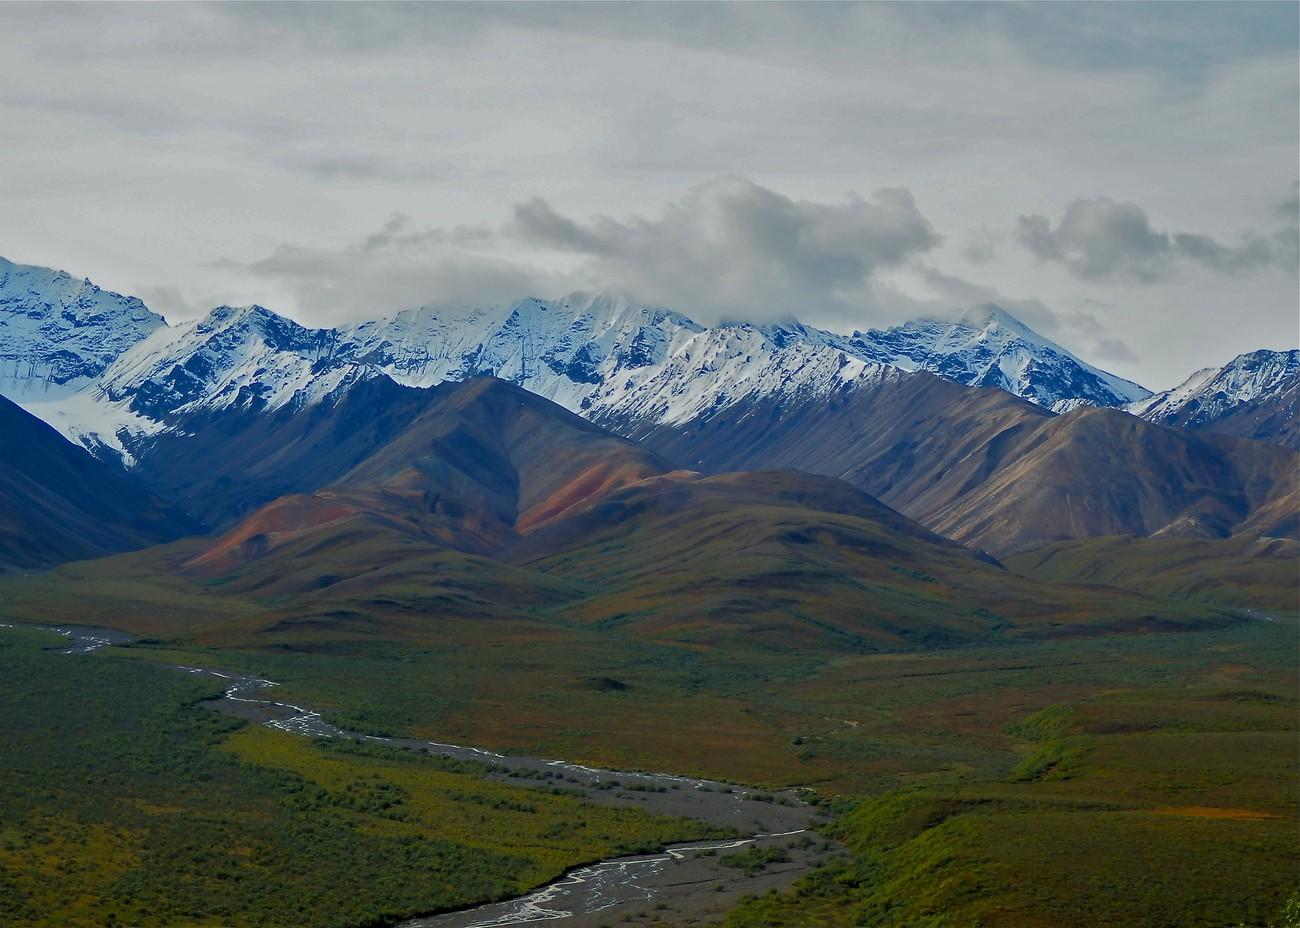 Denali National Park in August